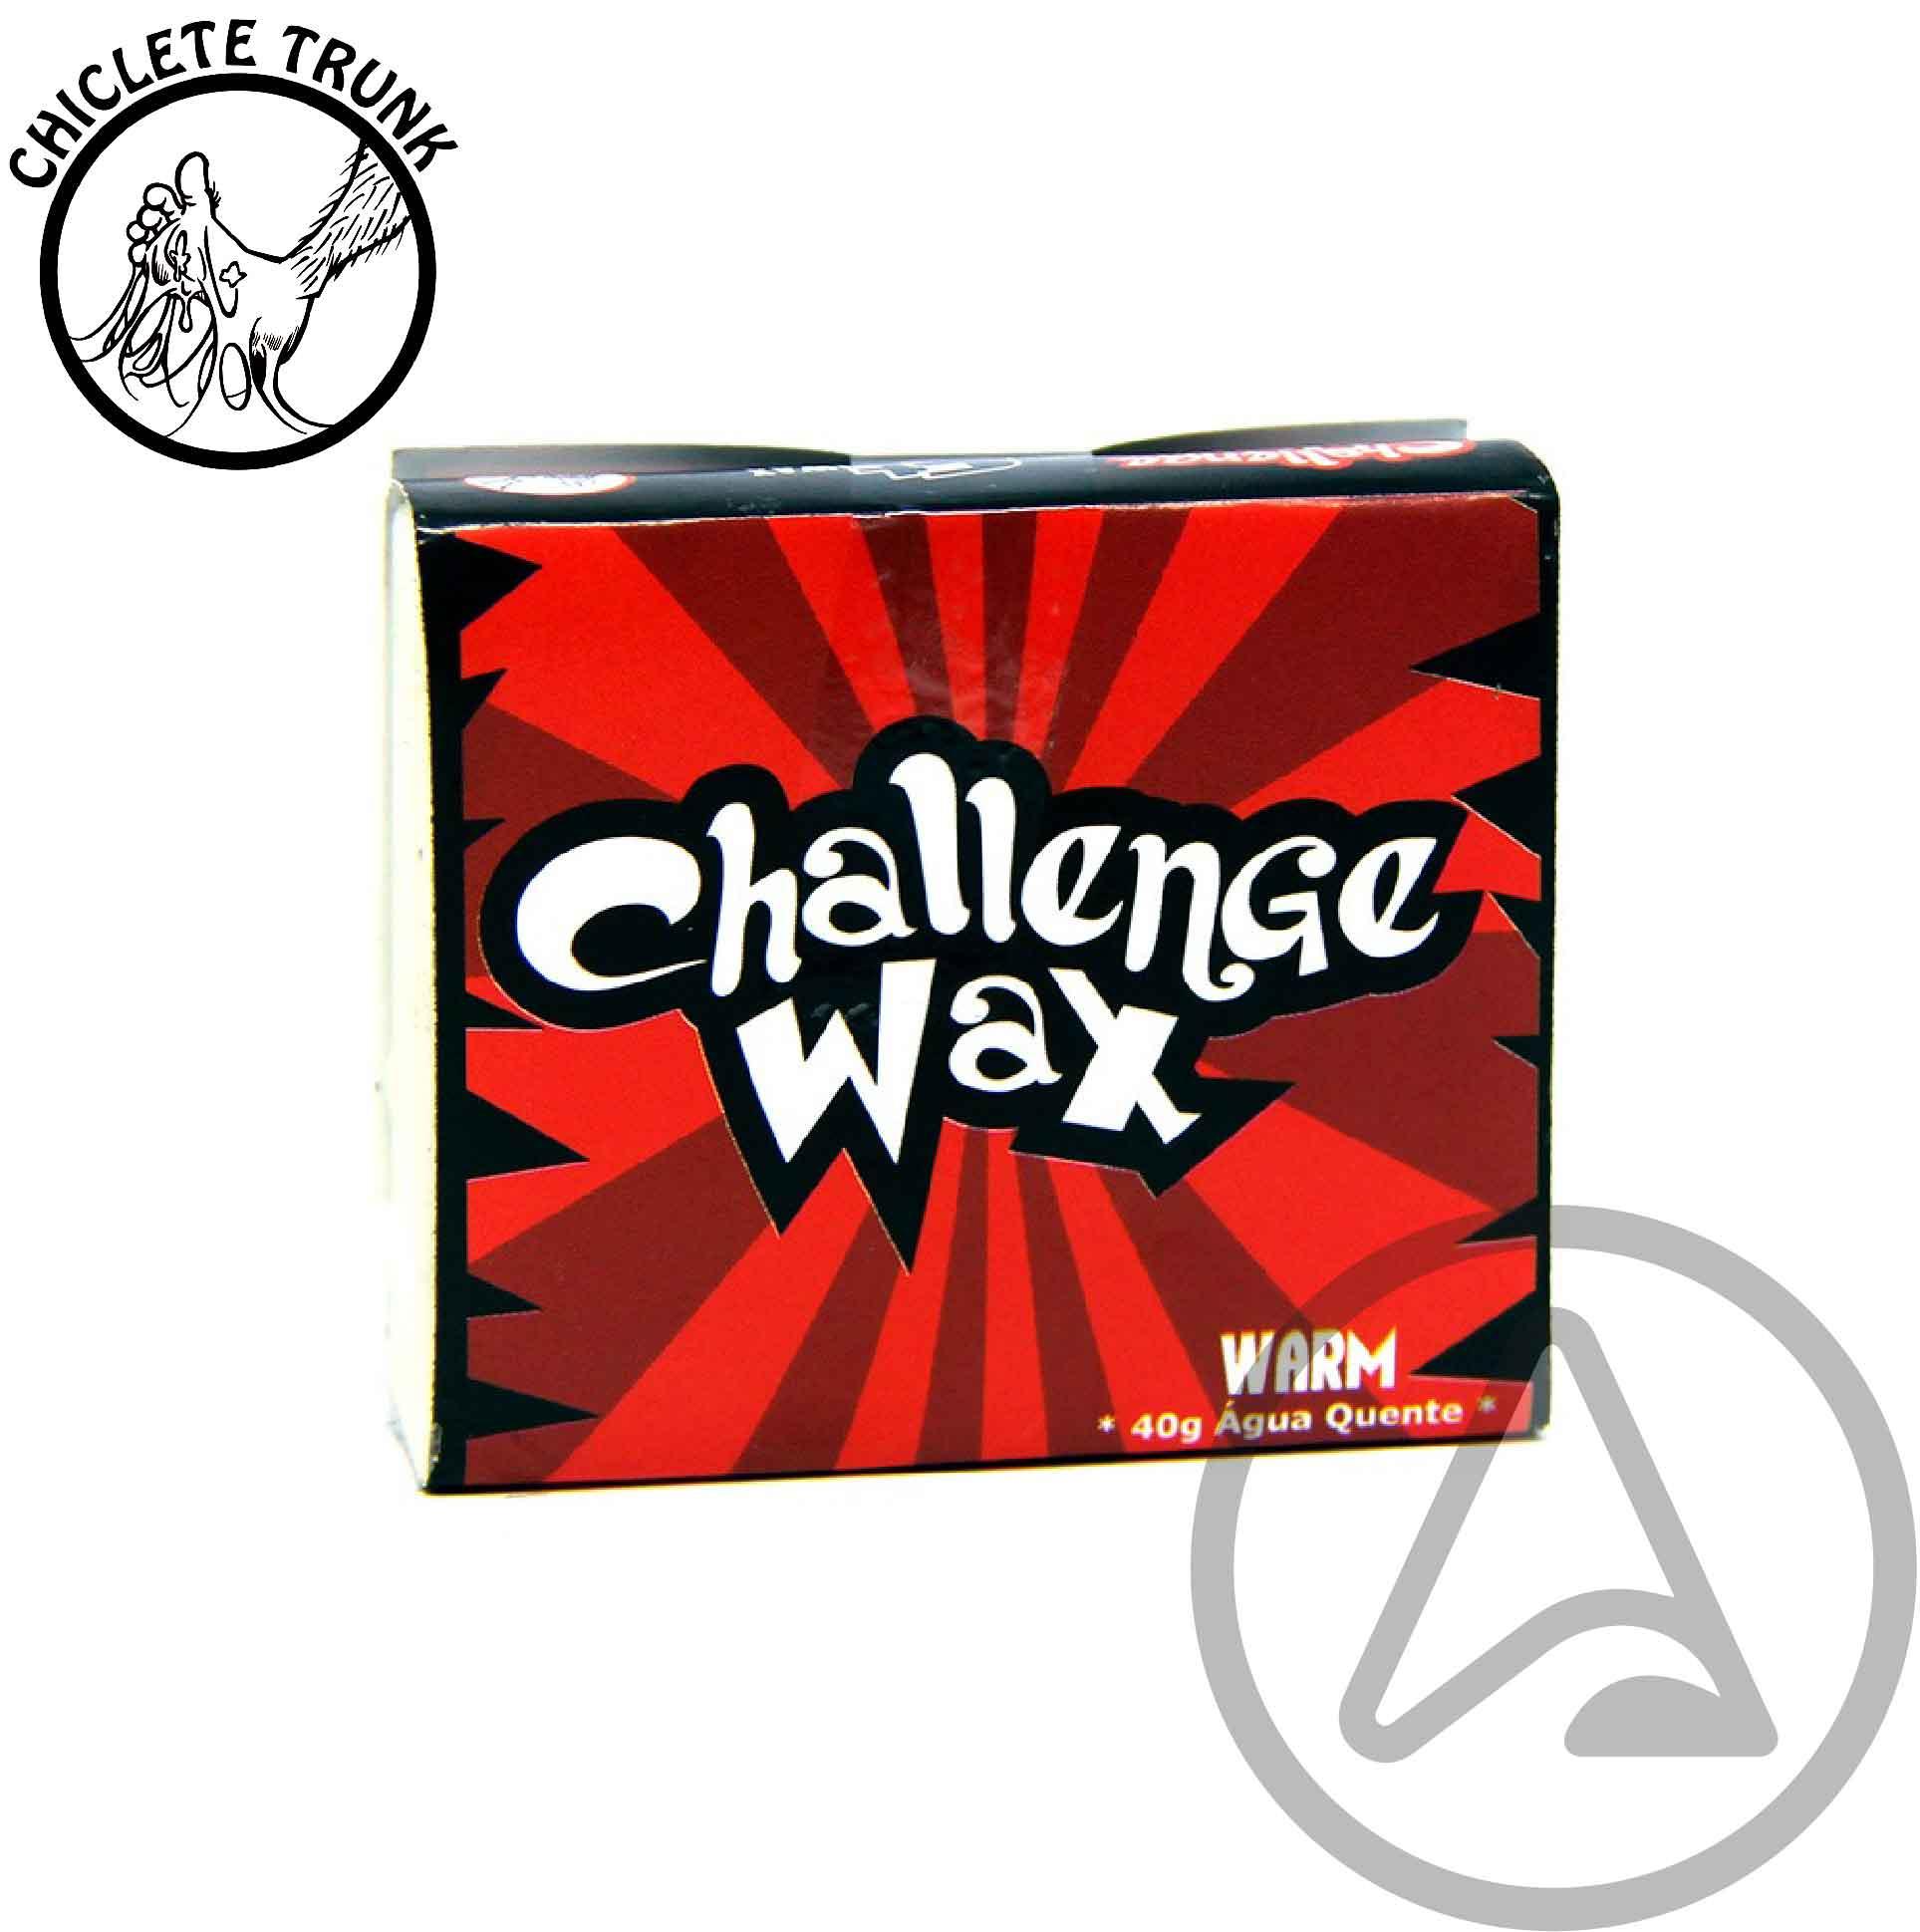 Parafinas CTWax Challenge Wax 40g- Água Gelada - Fria - Morna - Quente - Nordeste